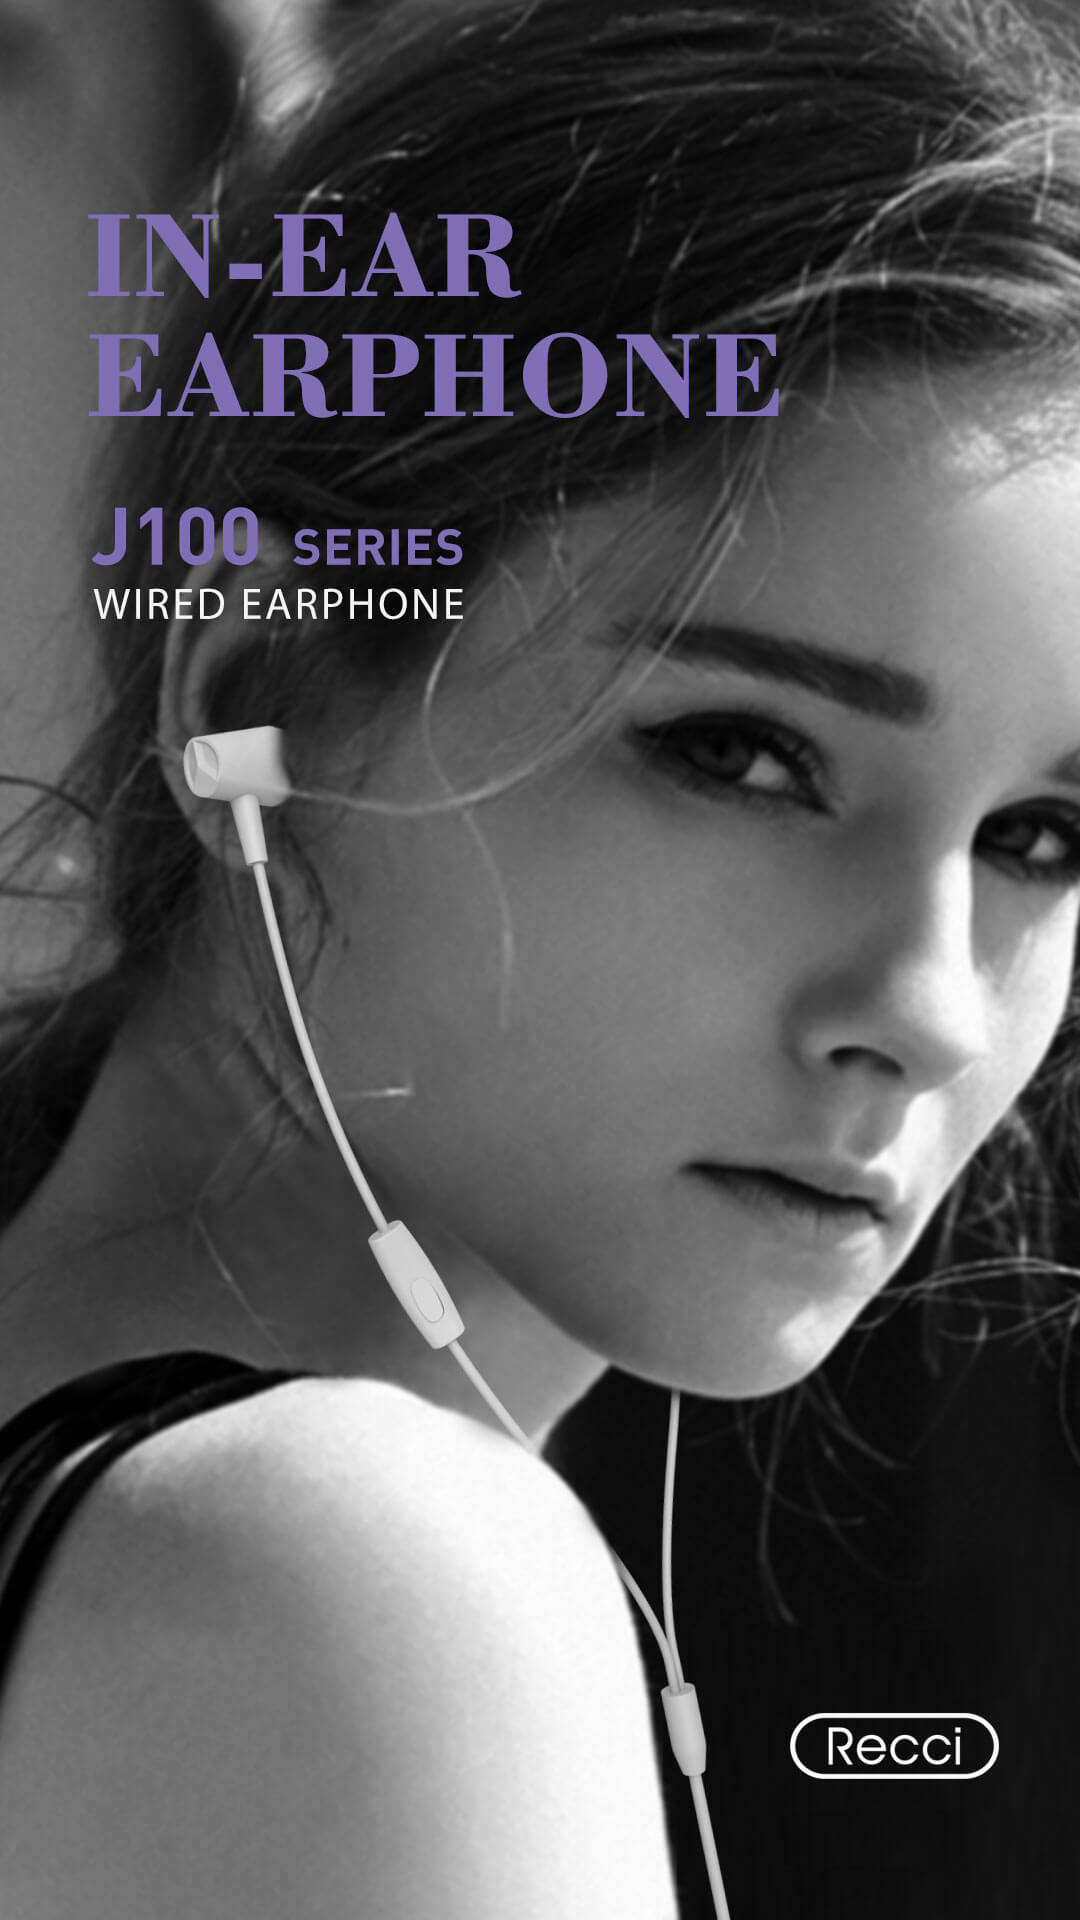 J100 Earphone Recci